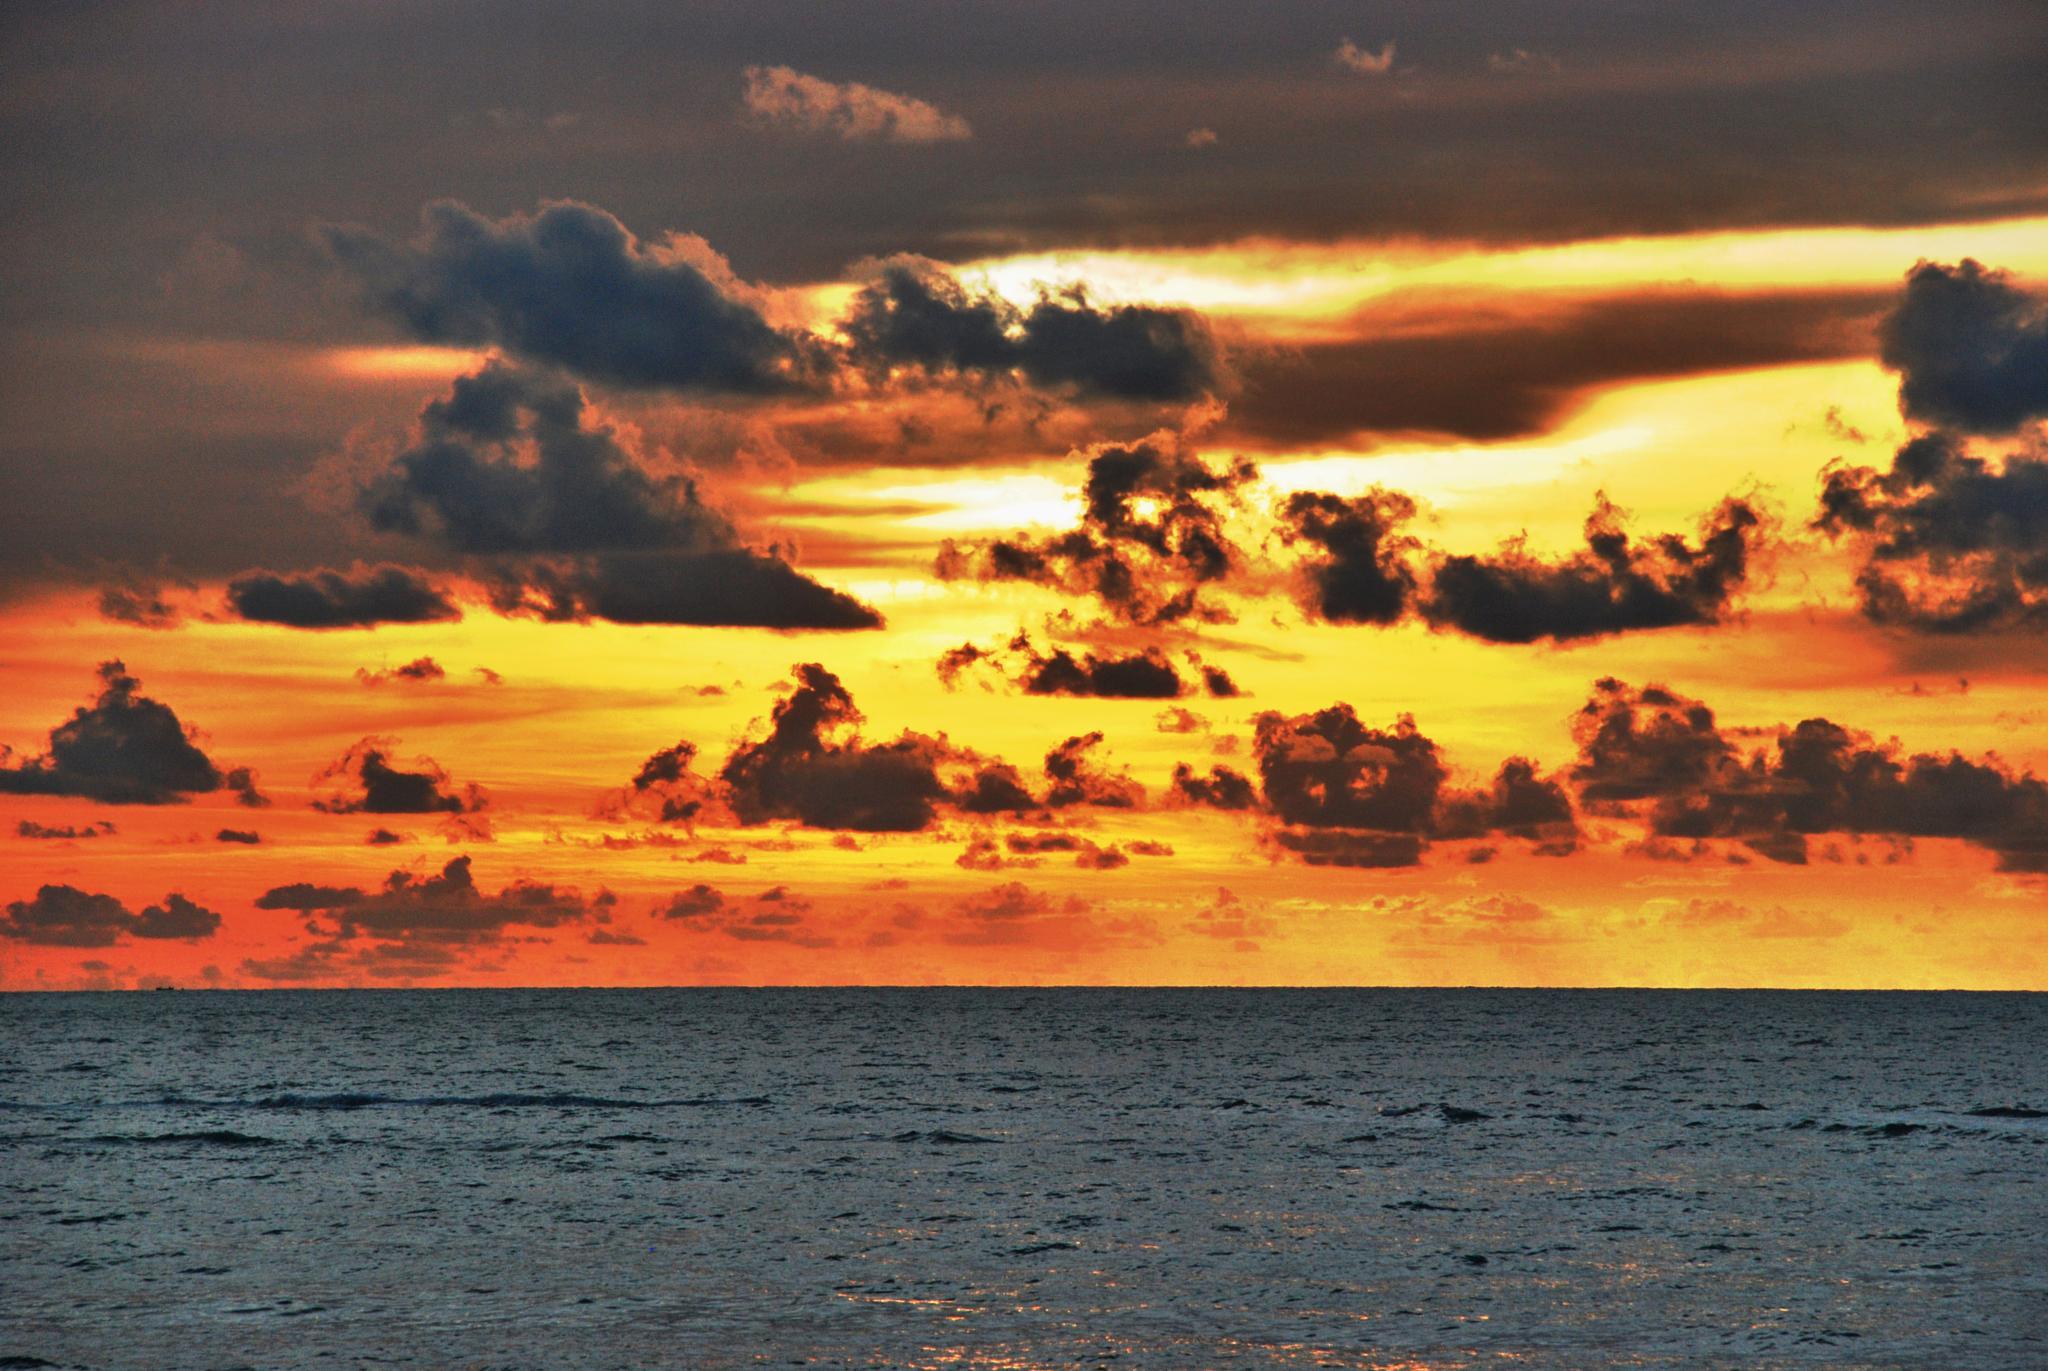 Sunset at Batu Ferringhi by wooyuenfoo